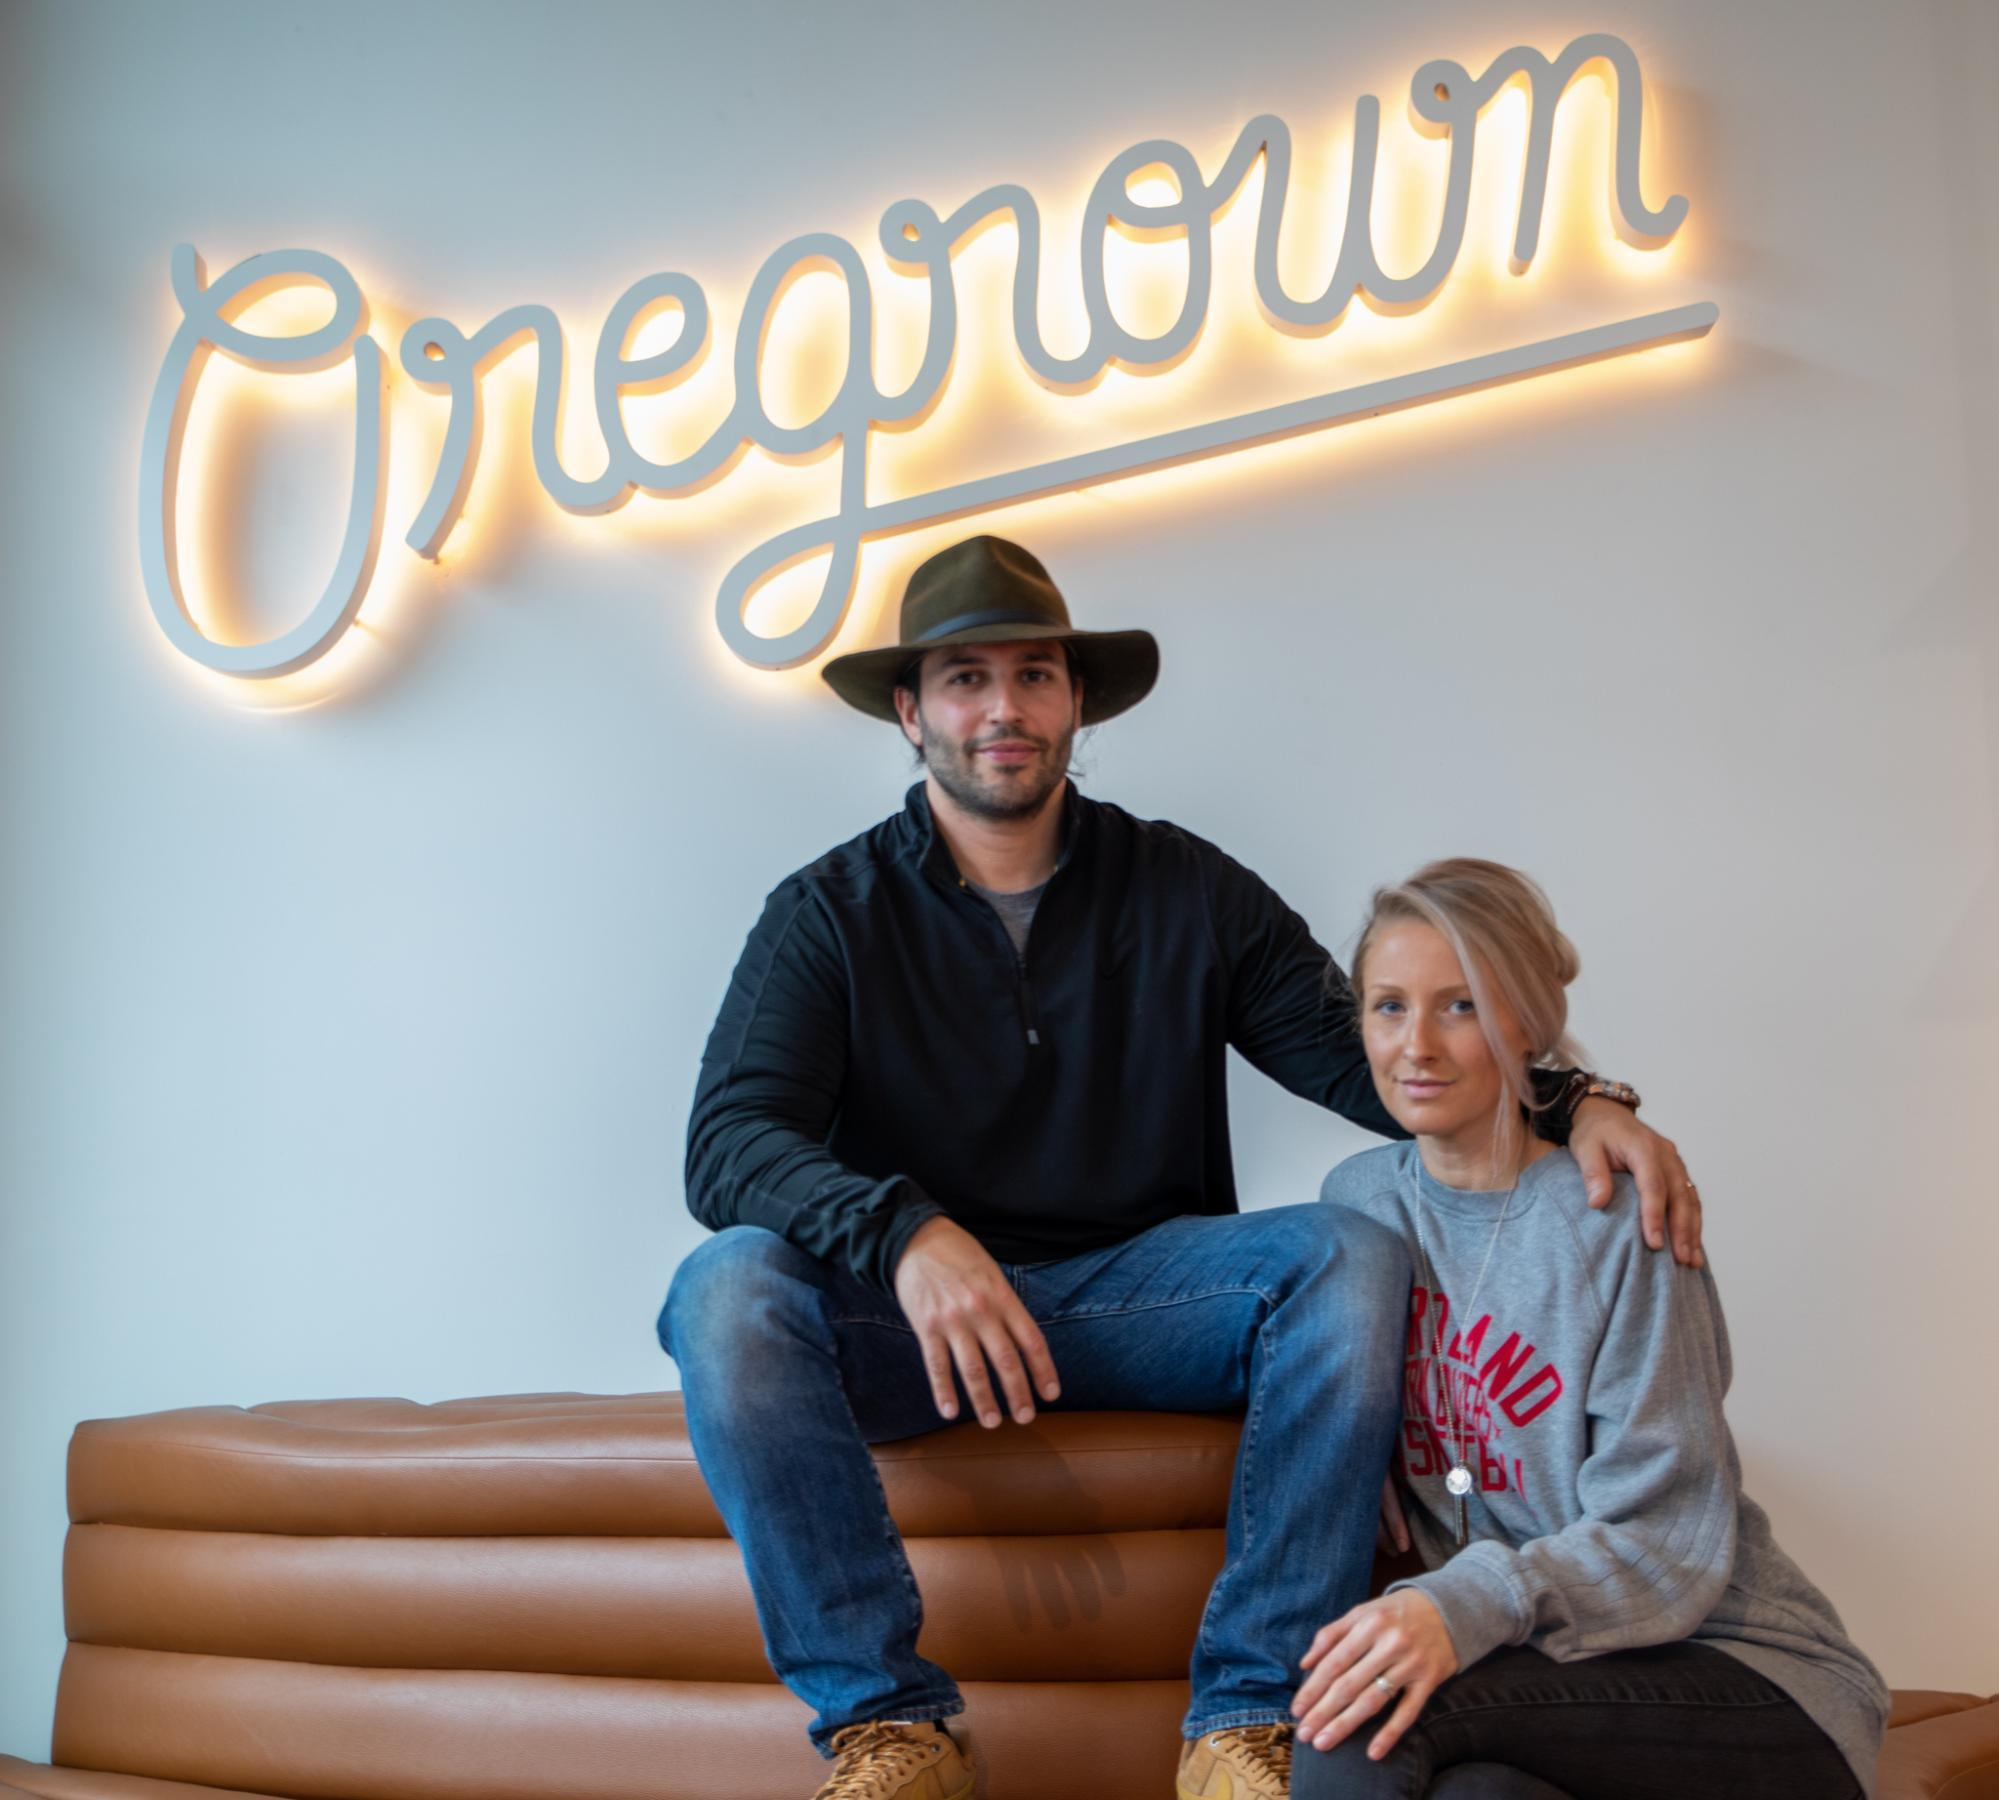 oregrown-dispensary-owners-aviv-chrissy-hadar